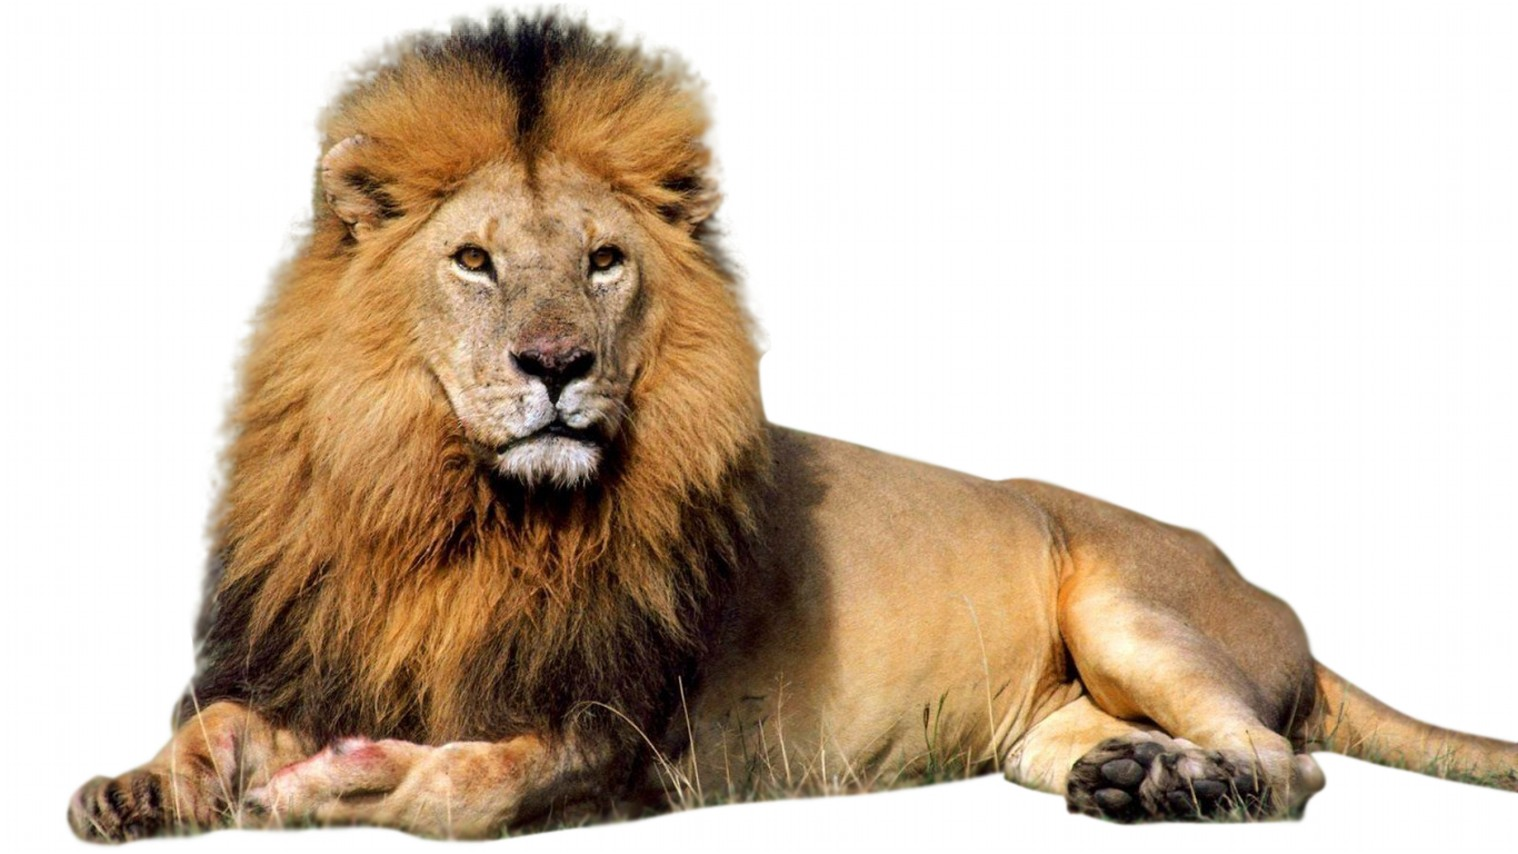 Contoh Dongeng Nusantara Fabel Empat Sapi Dan Singa – Cuitan